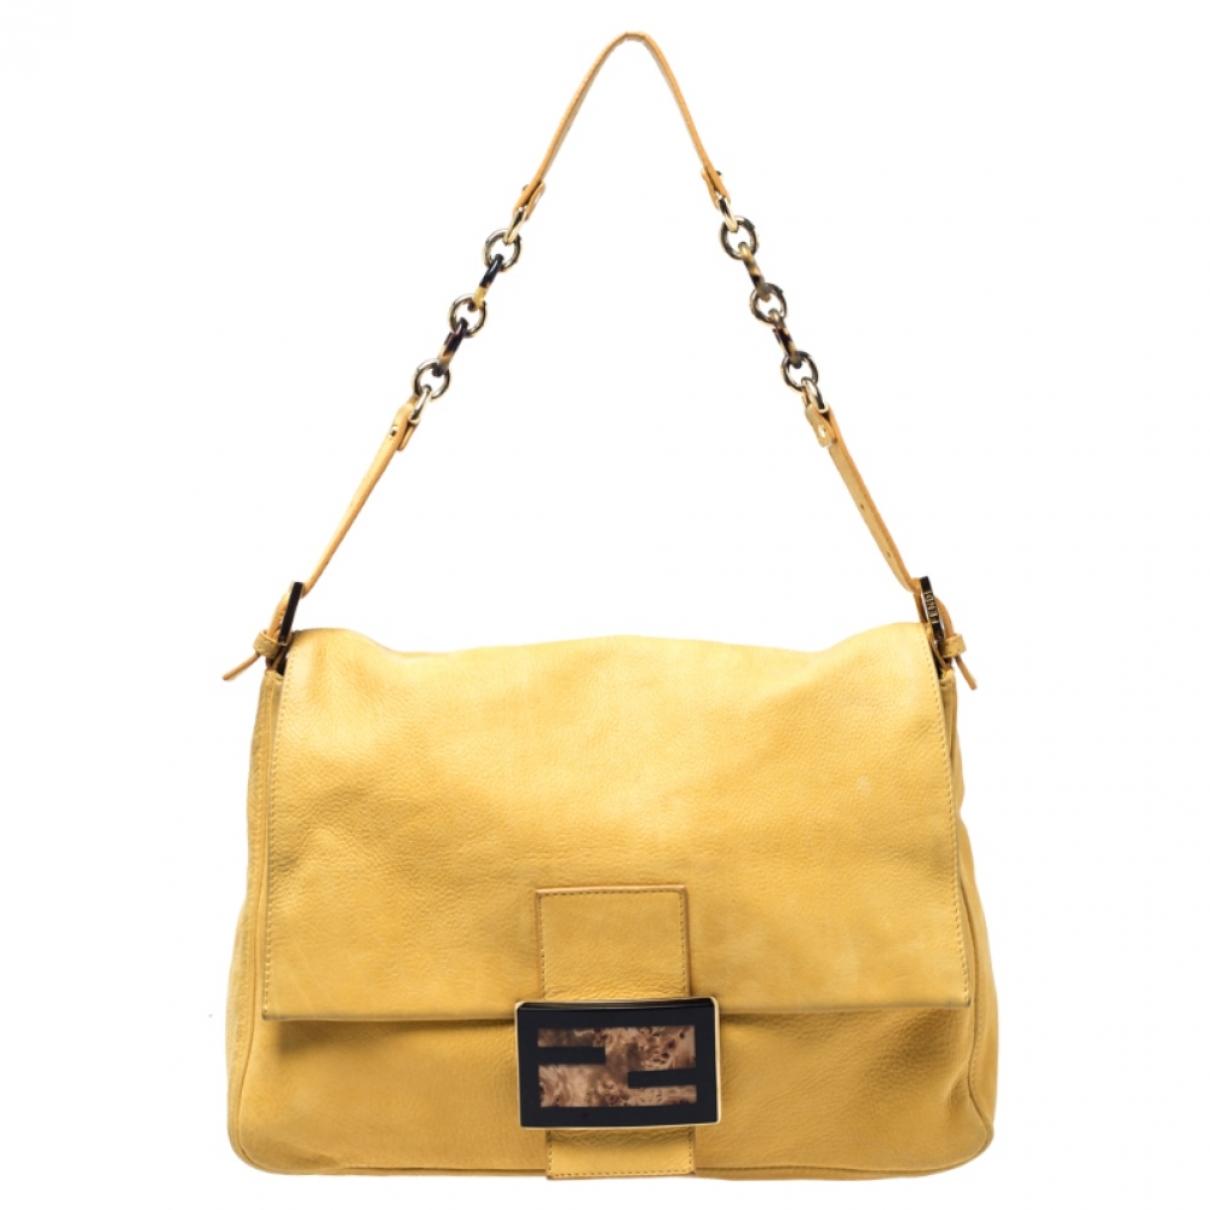 Fendi Mamma Baguette  Handtasche in  Gelb Leder